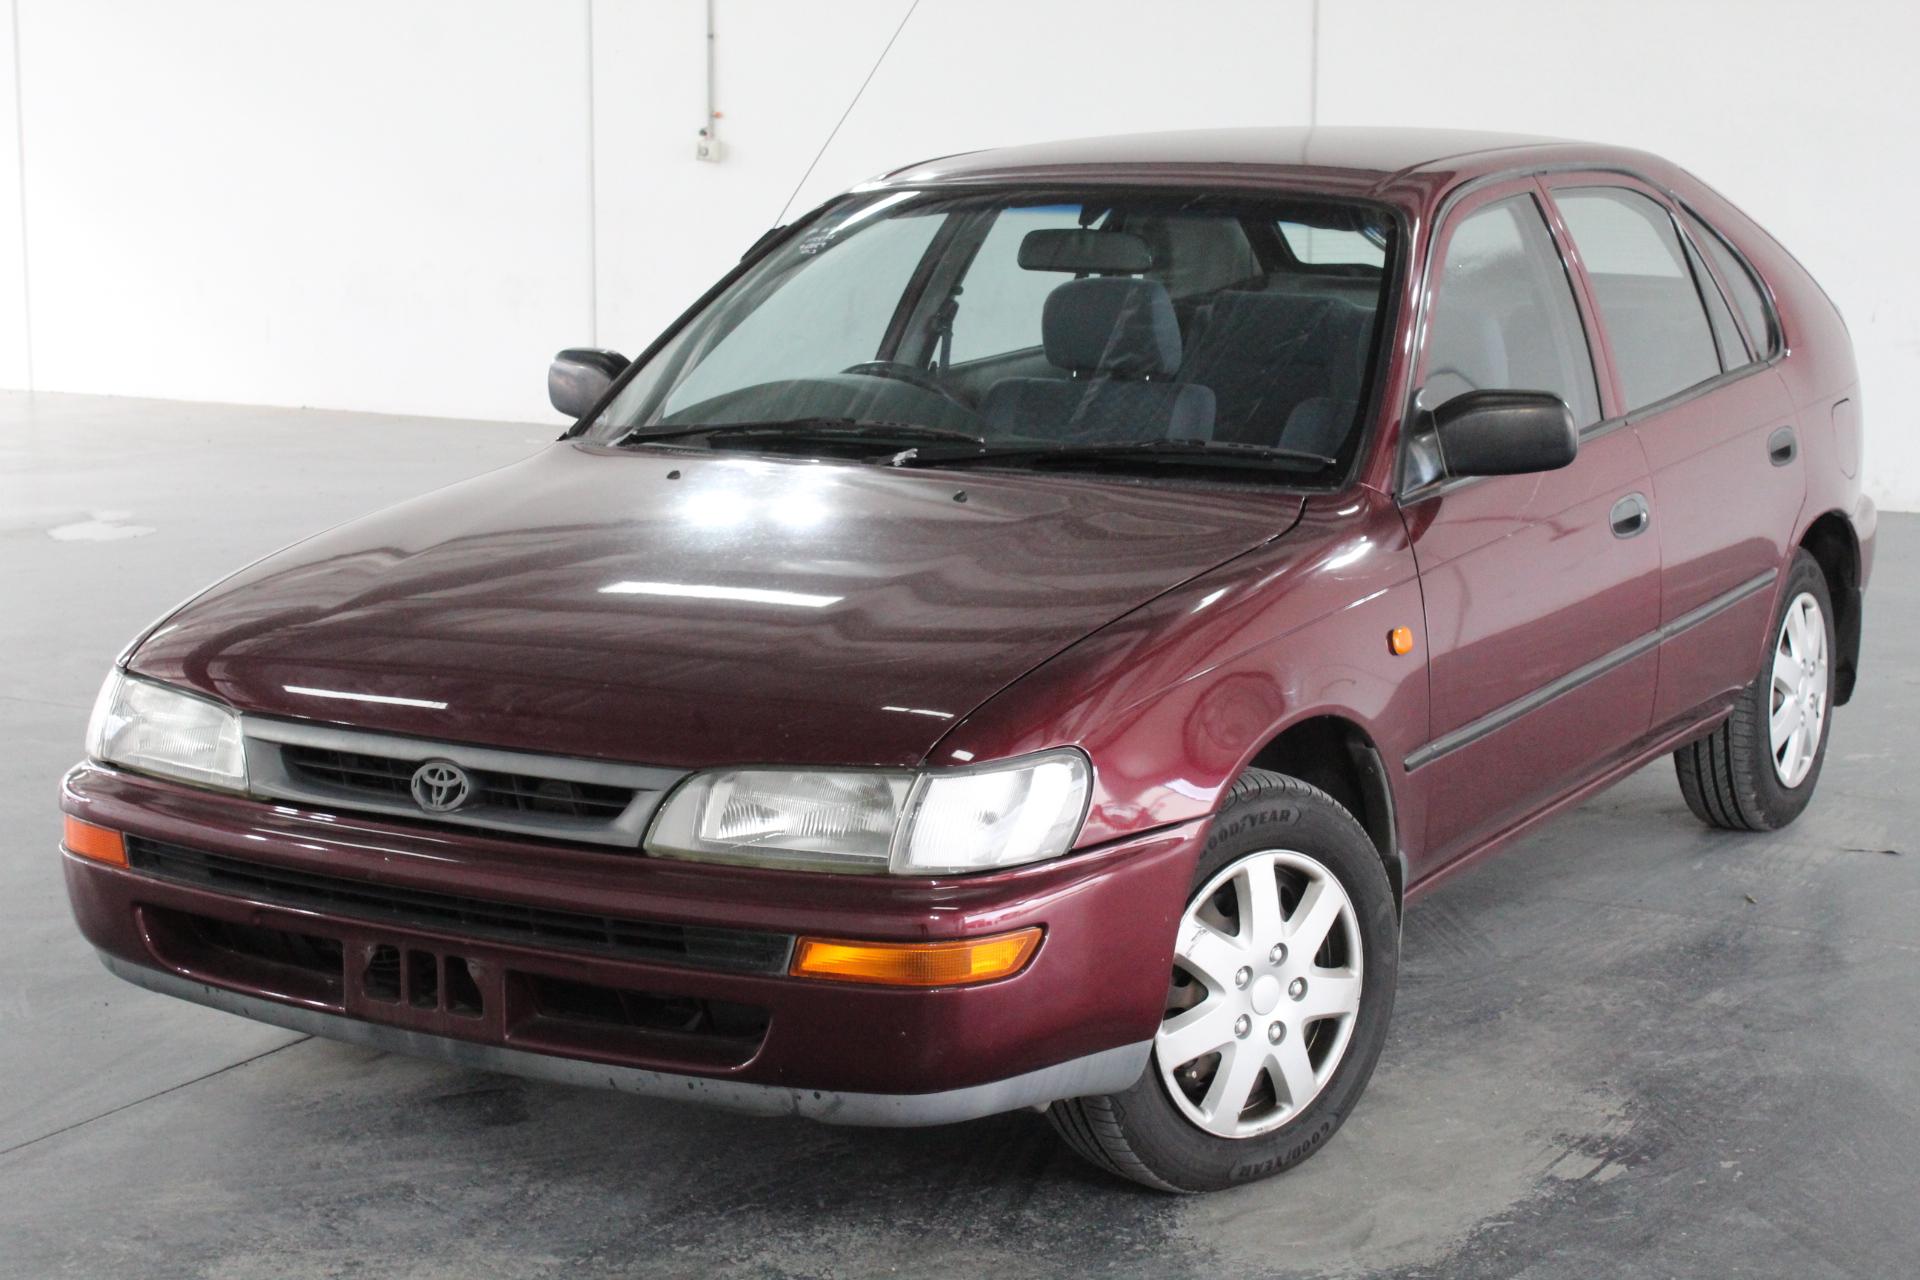 1998 Toyota Corolla Conquest Seca AE102 Automatic Hatchback